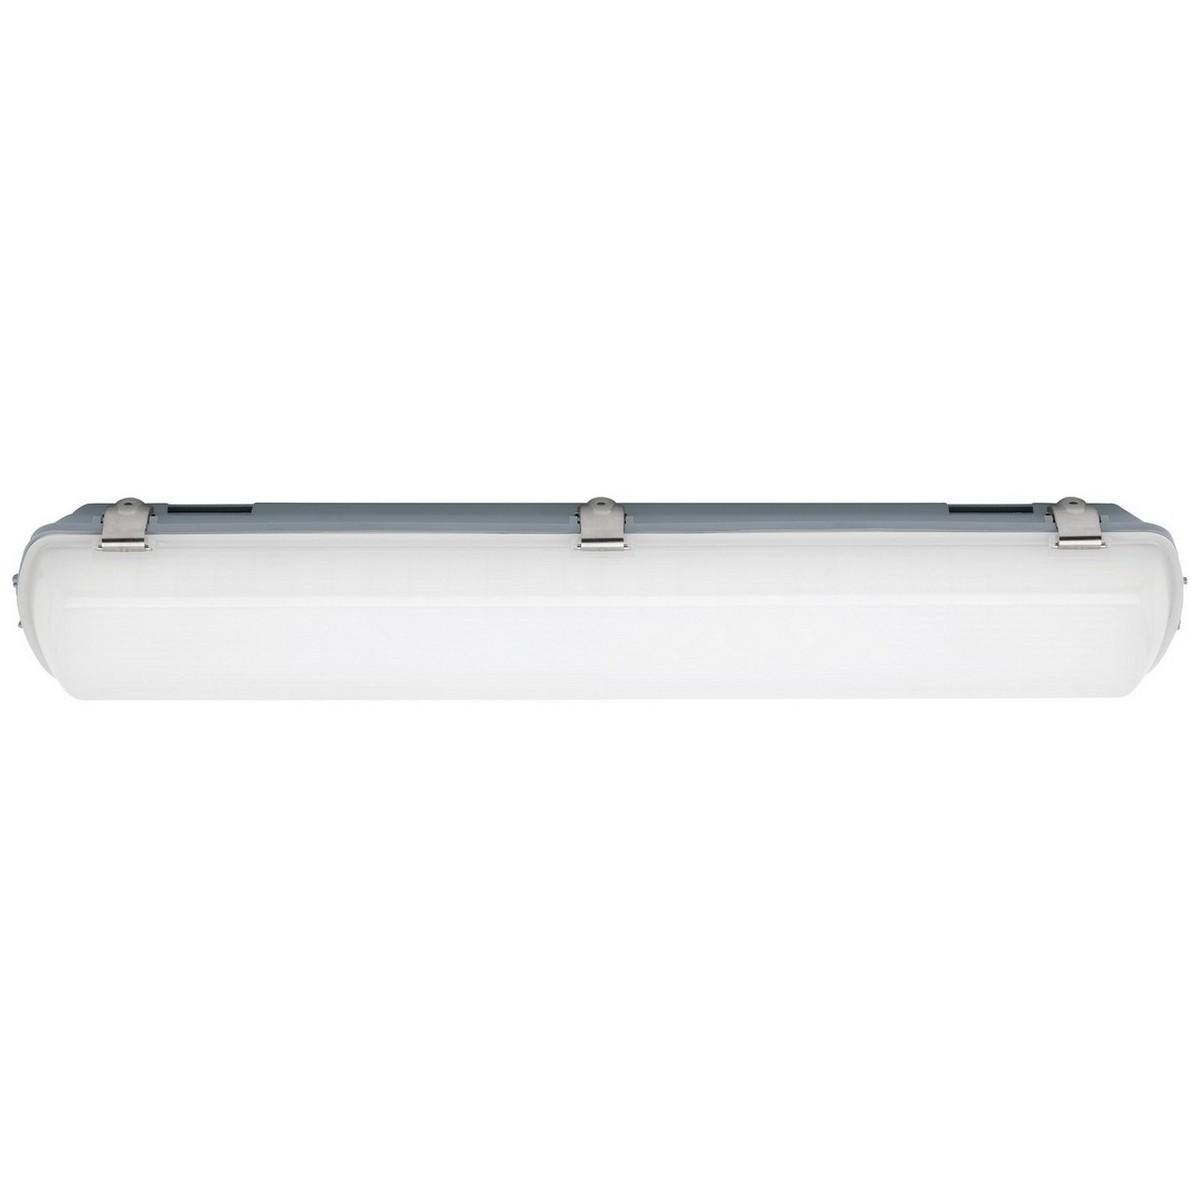 Wave Commercial Grade IP65 Tri-Proof LED Batten Fix Ceiling Light, 20W